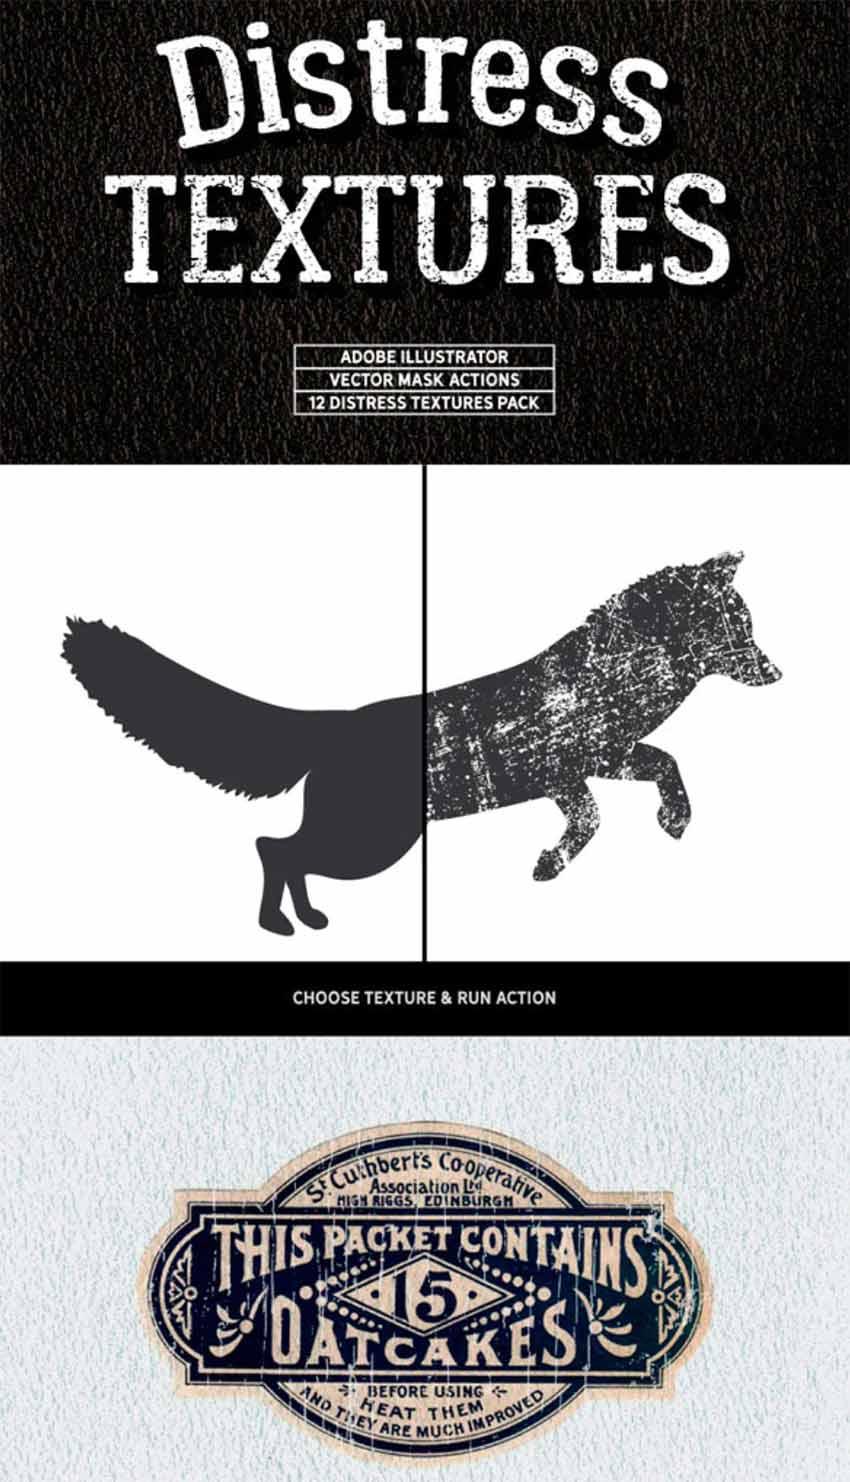 Distressed Texture Illustrator Pack (AI)